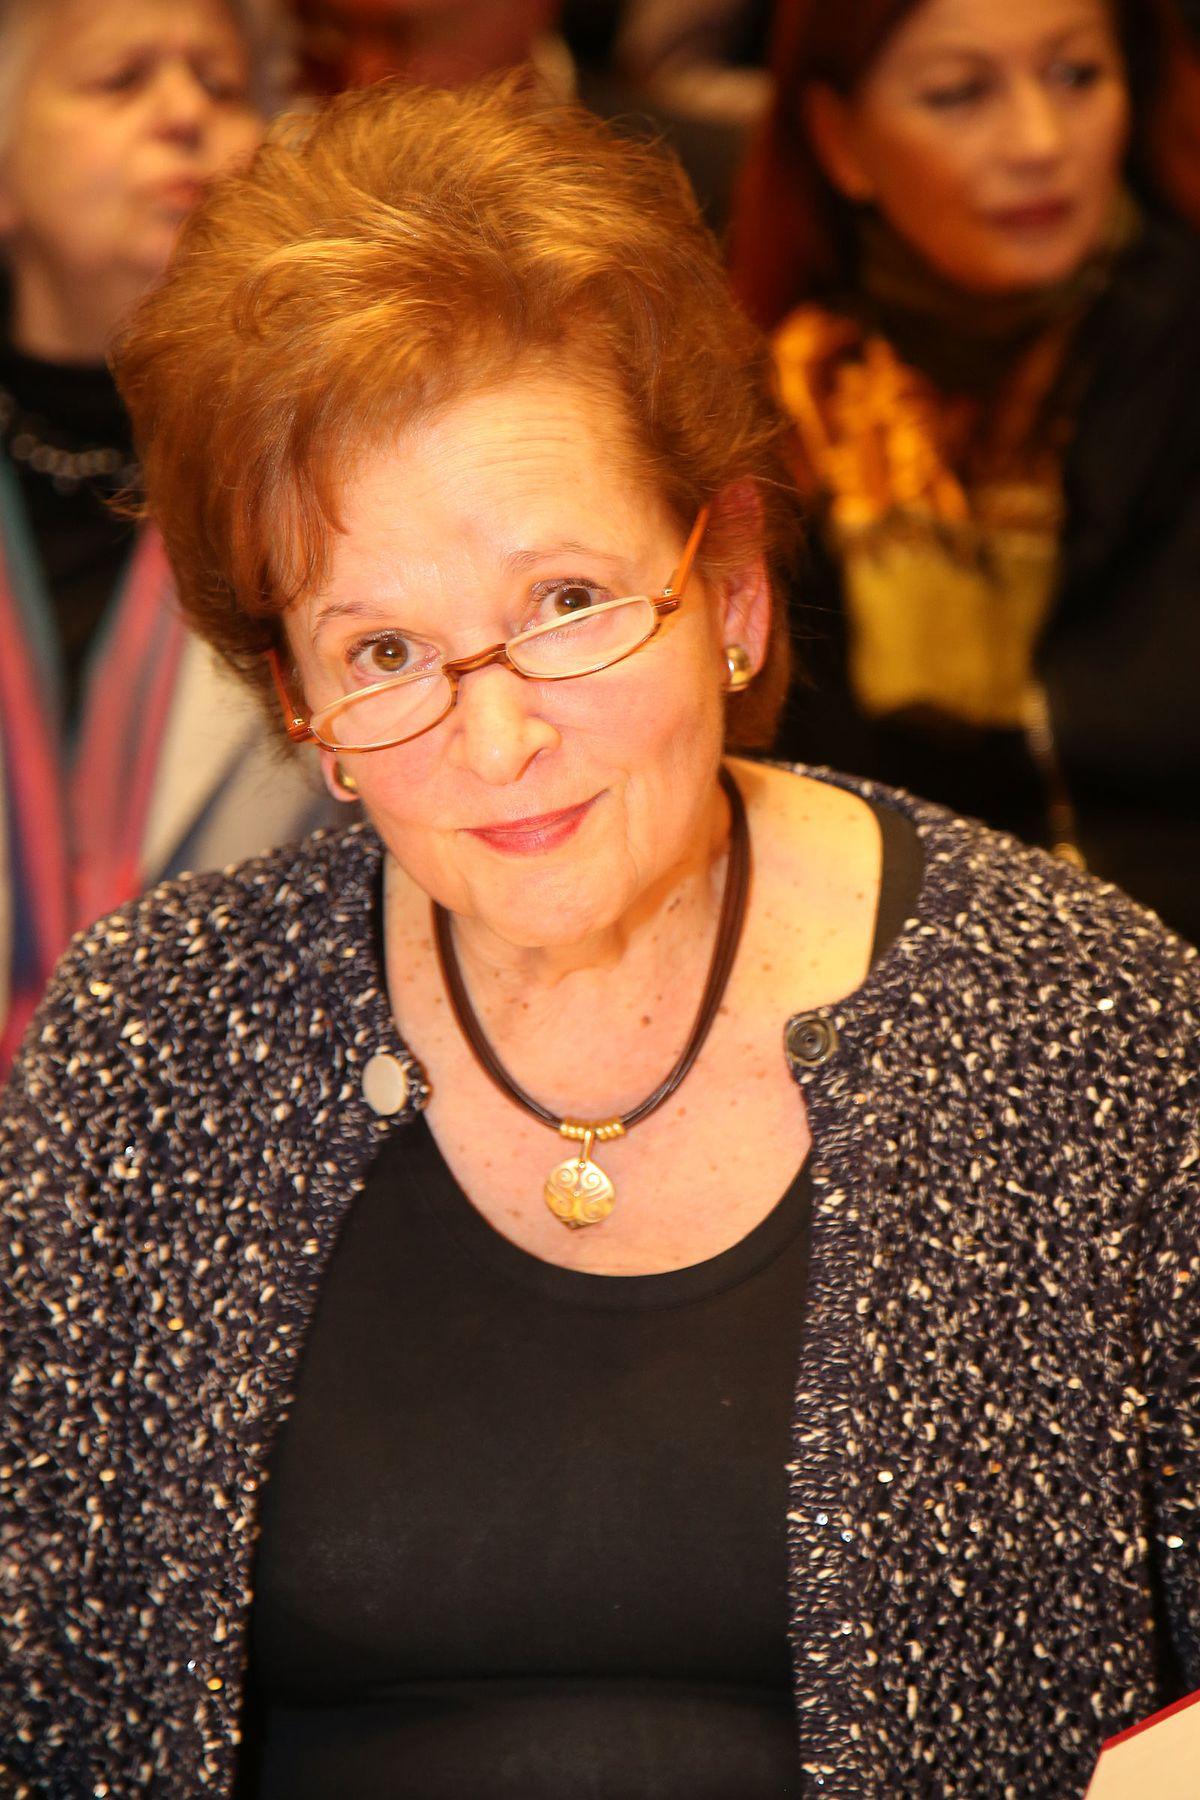 Communication on this topic: Kiele Sanchez, maria-venuti/